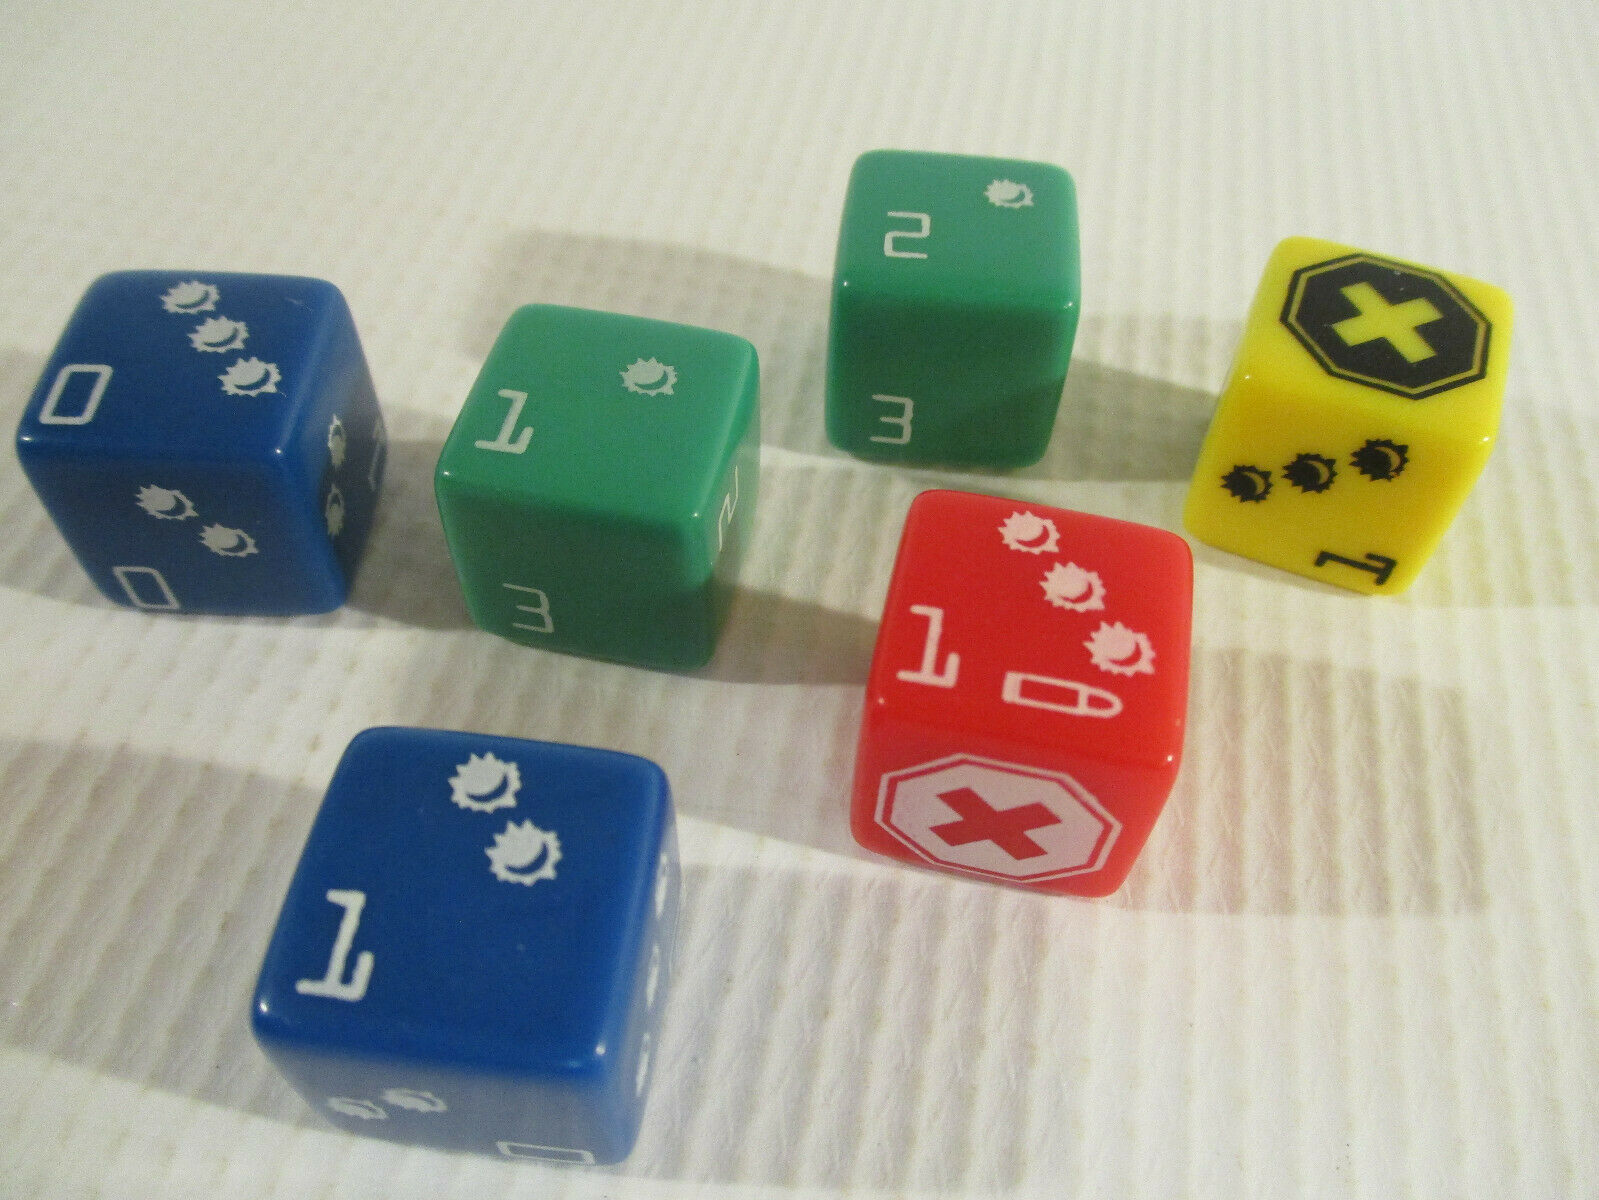 DOOM: The Board Game ORIGINAL DICE SET by Fantasy Flight Gam